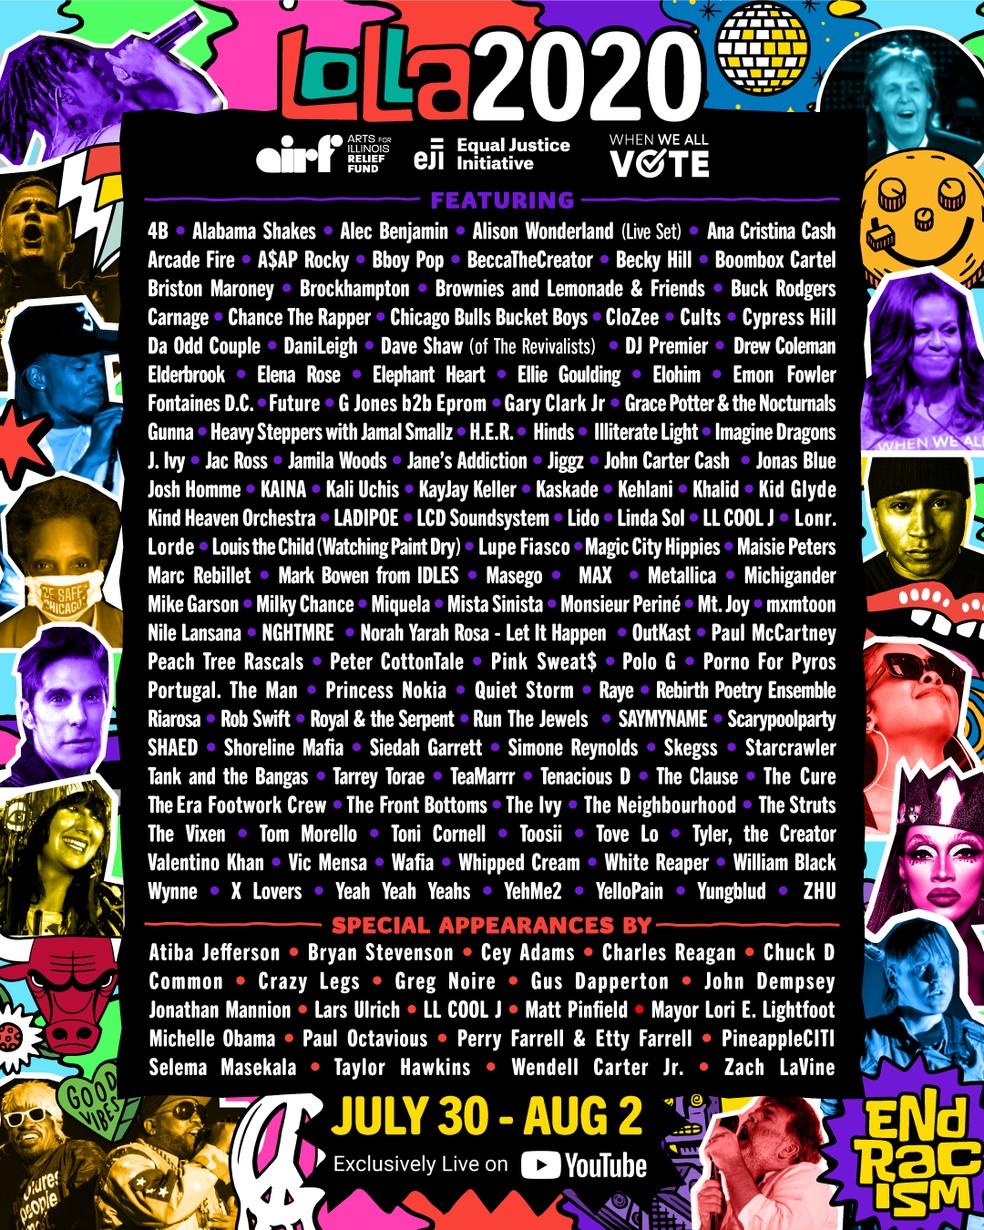 Lollapalooza anuncia programação de festival online a partir de quinta (30) — Foto: Reprodução/Twitter/Lollapalooza